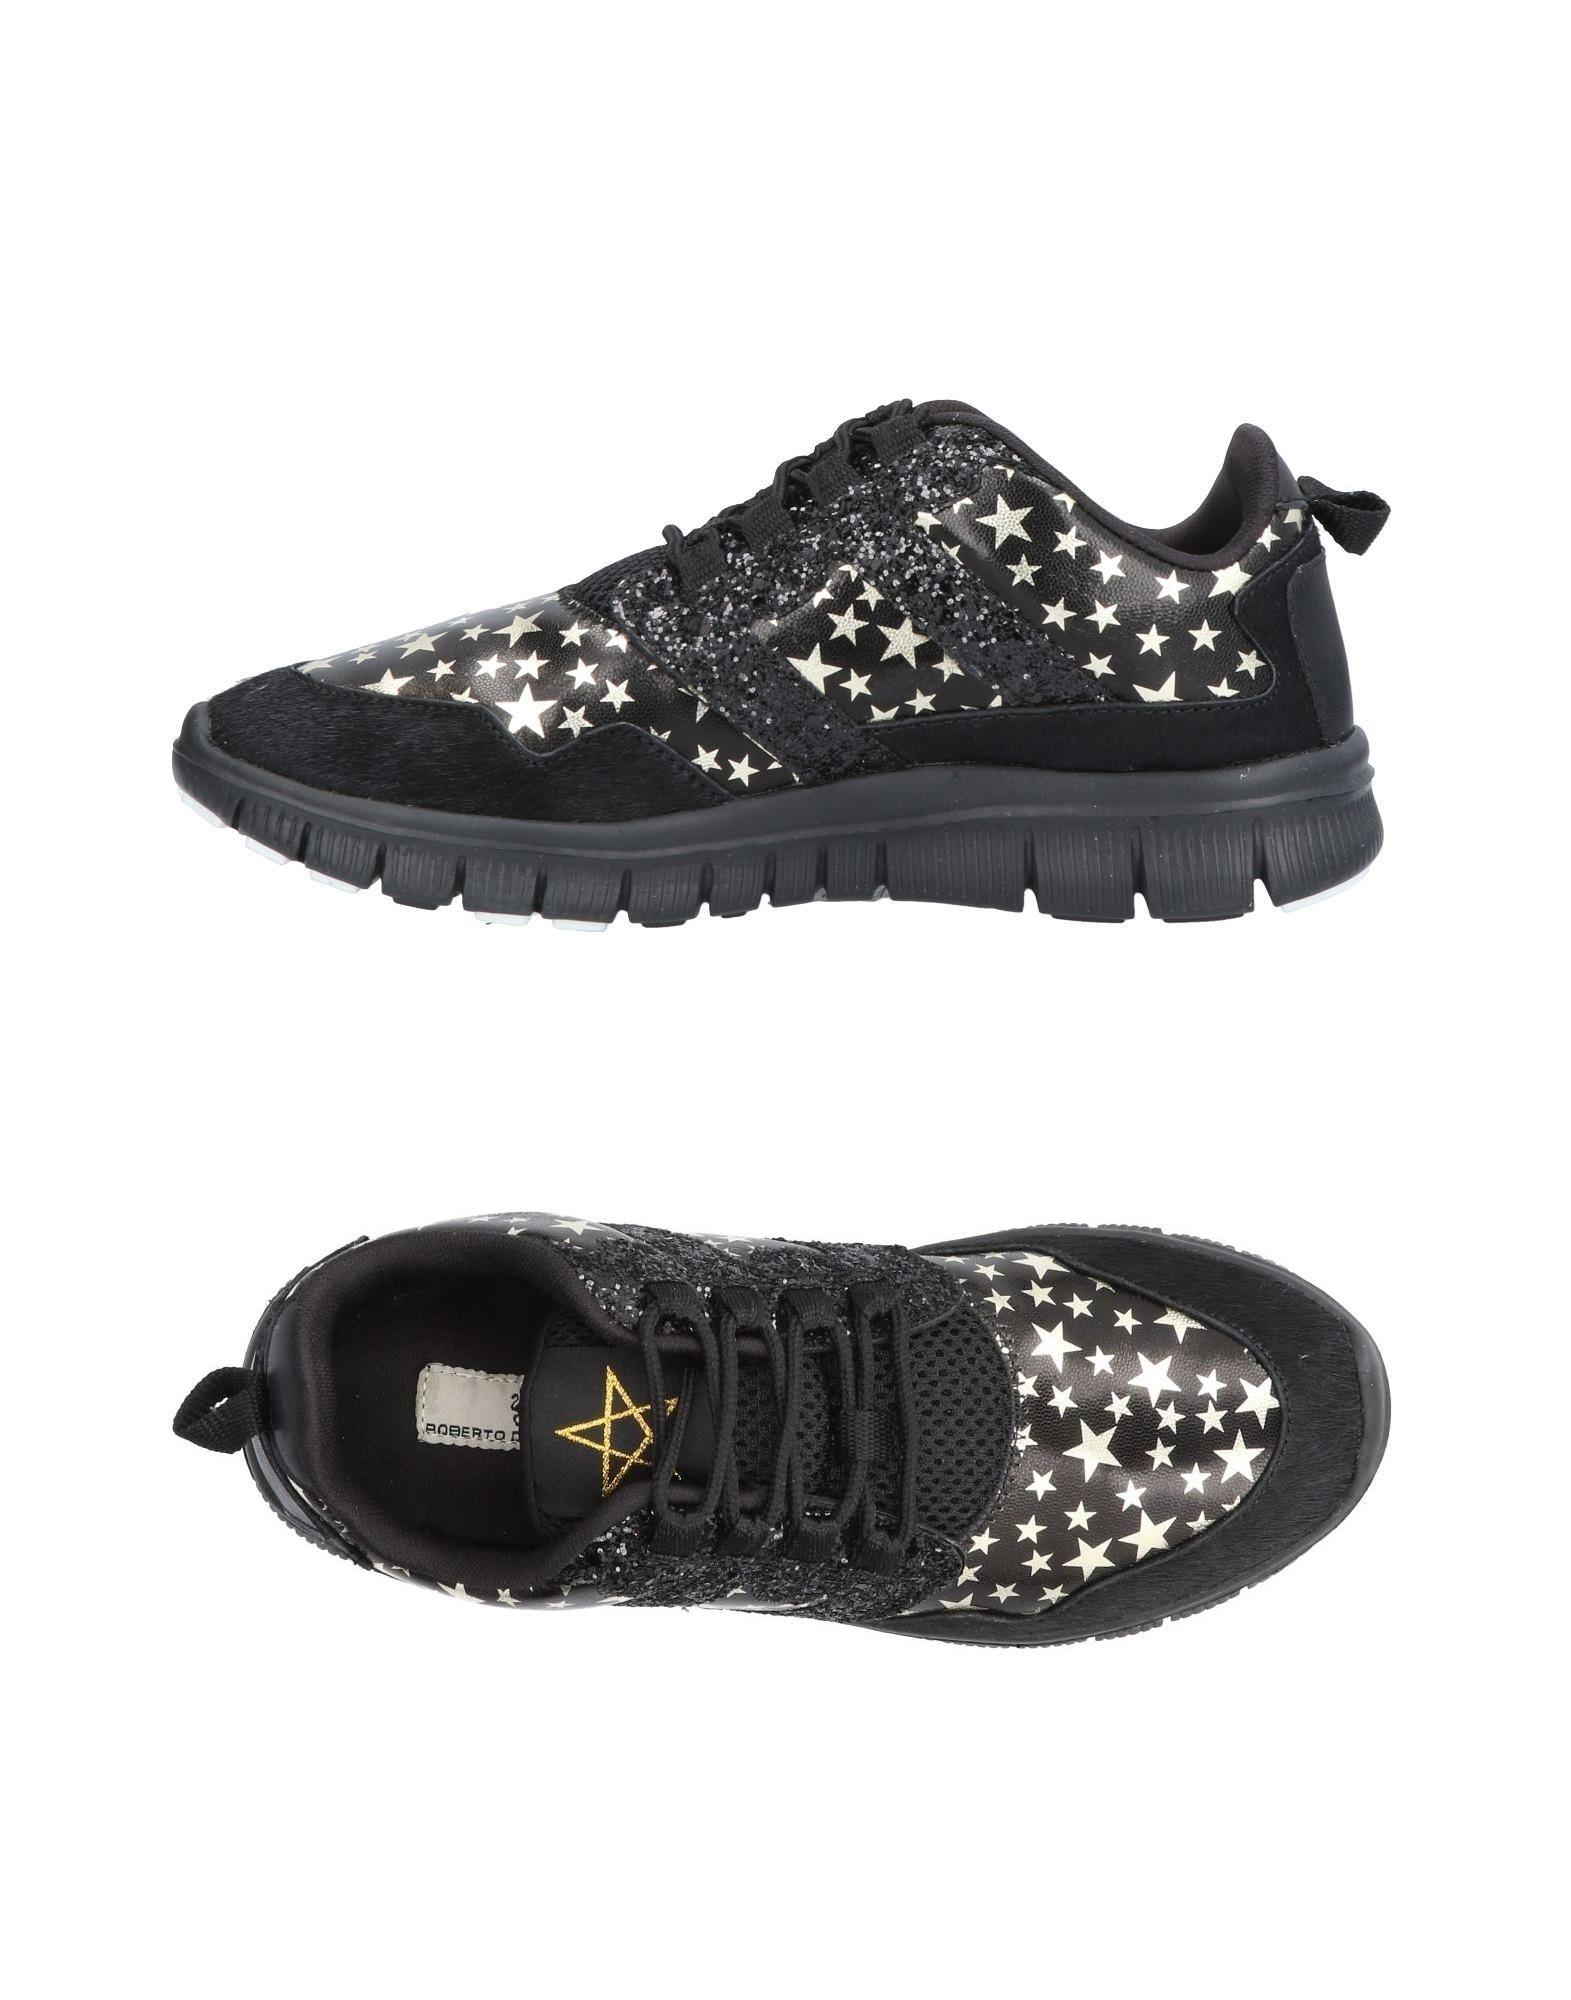 Roberto Della Croce Sneakers Damen  11456015UL Gute Qualität beliebte Schuhe